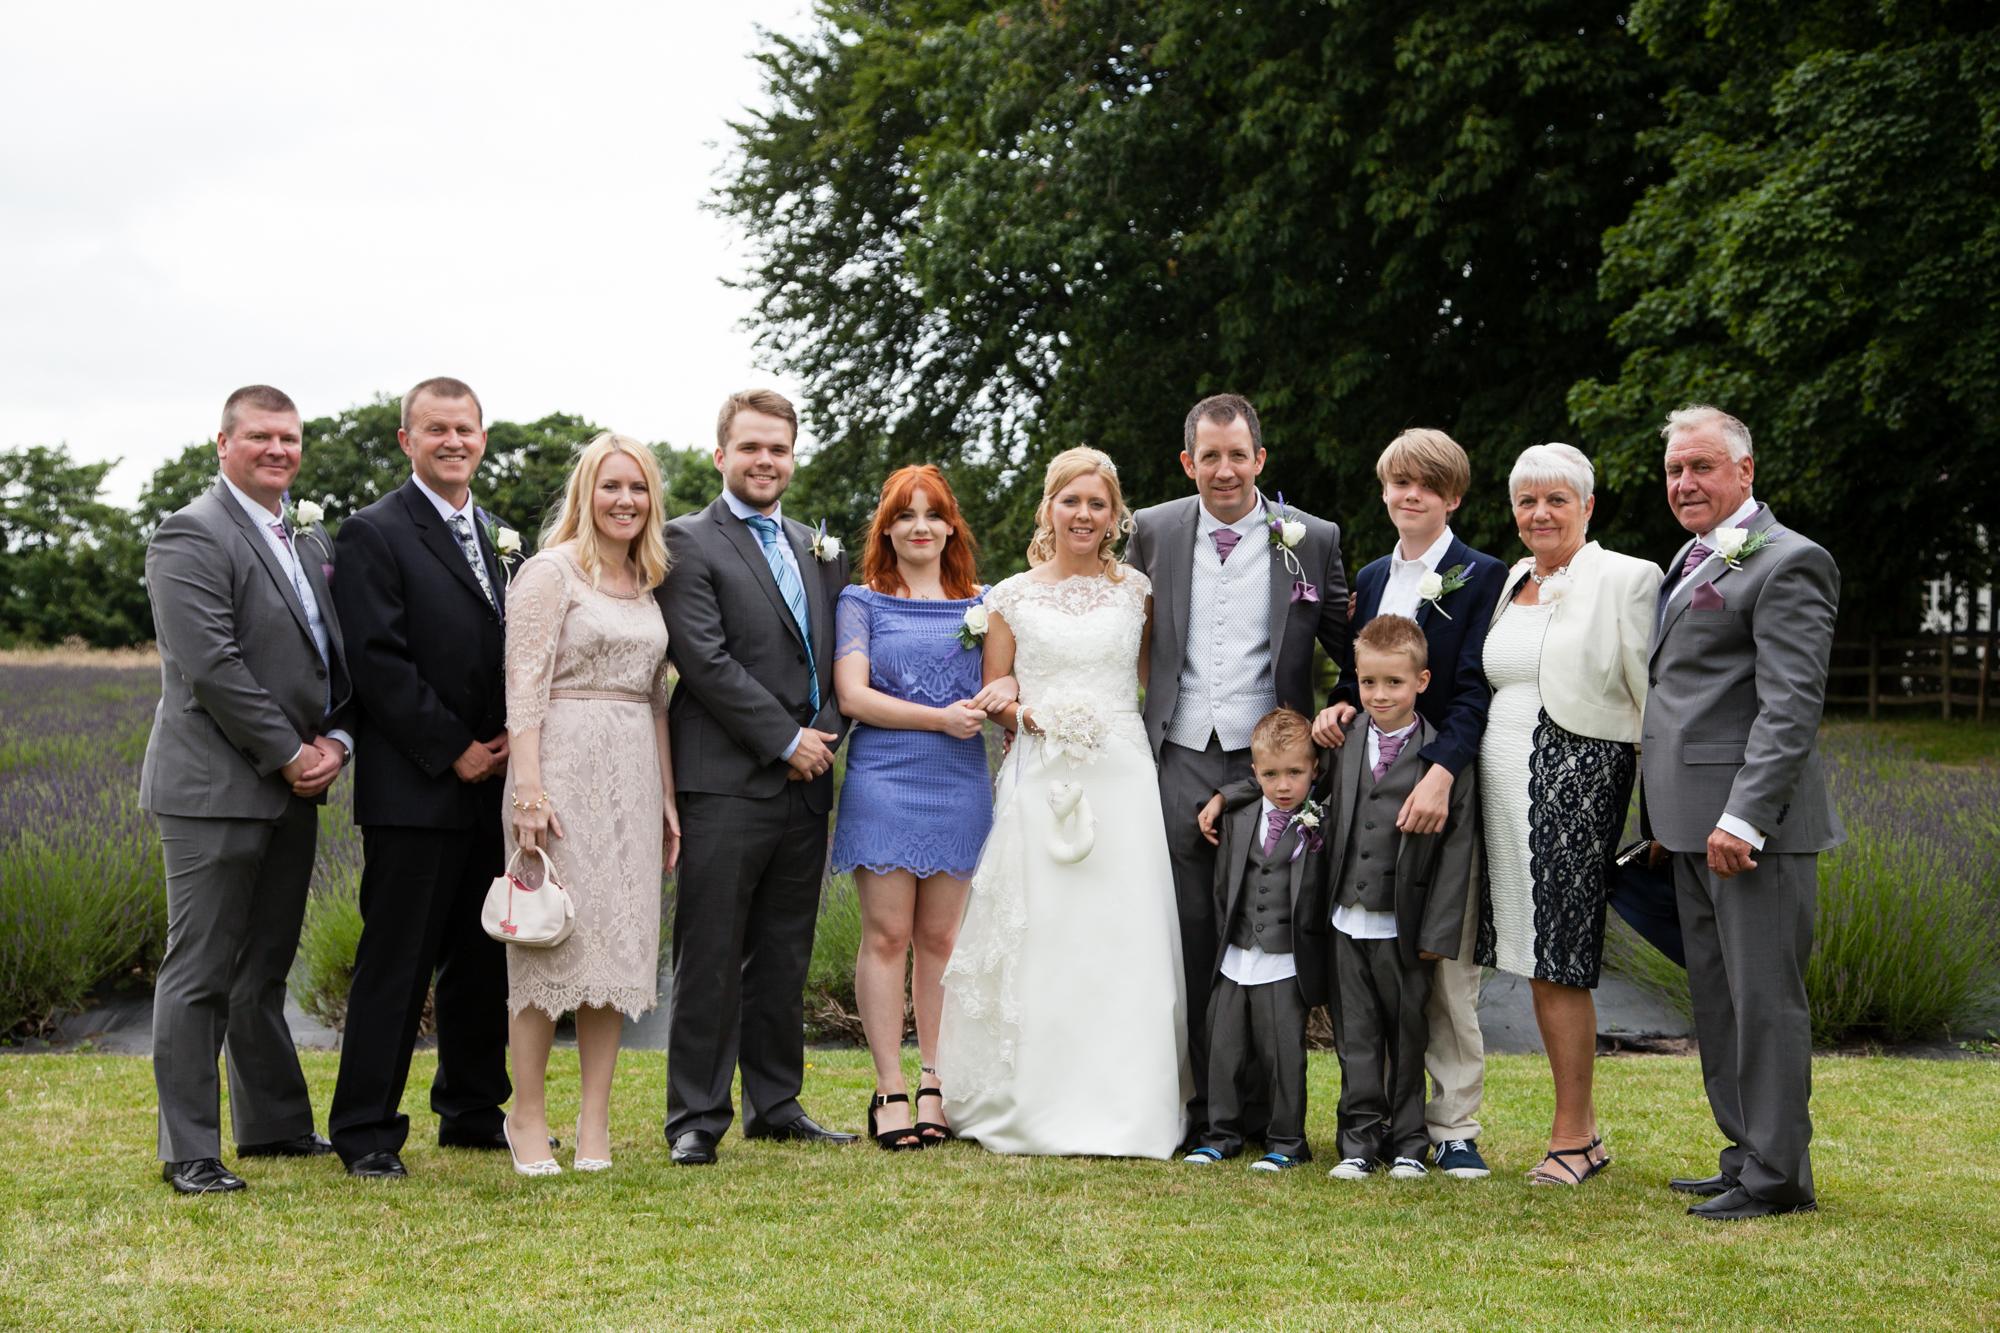 110715_LisaCraigJohnson_Wedding_5846438_WebWM.jpg